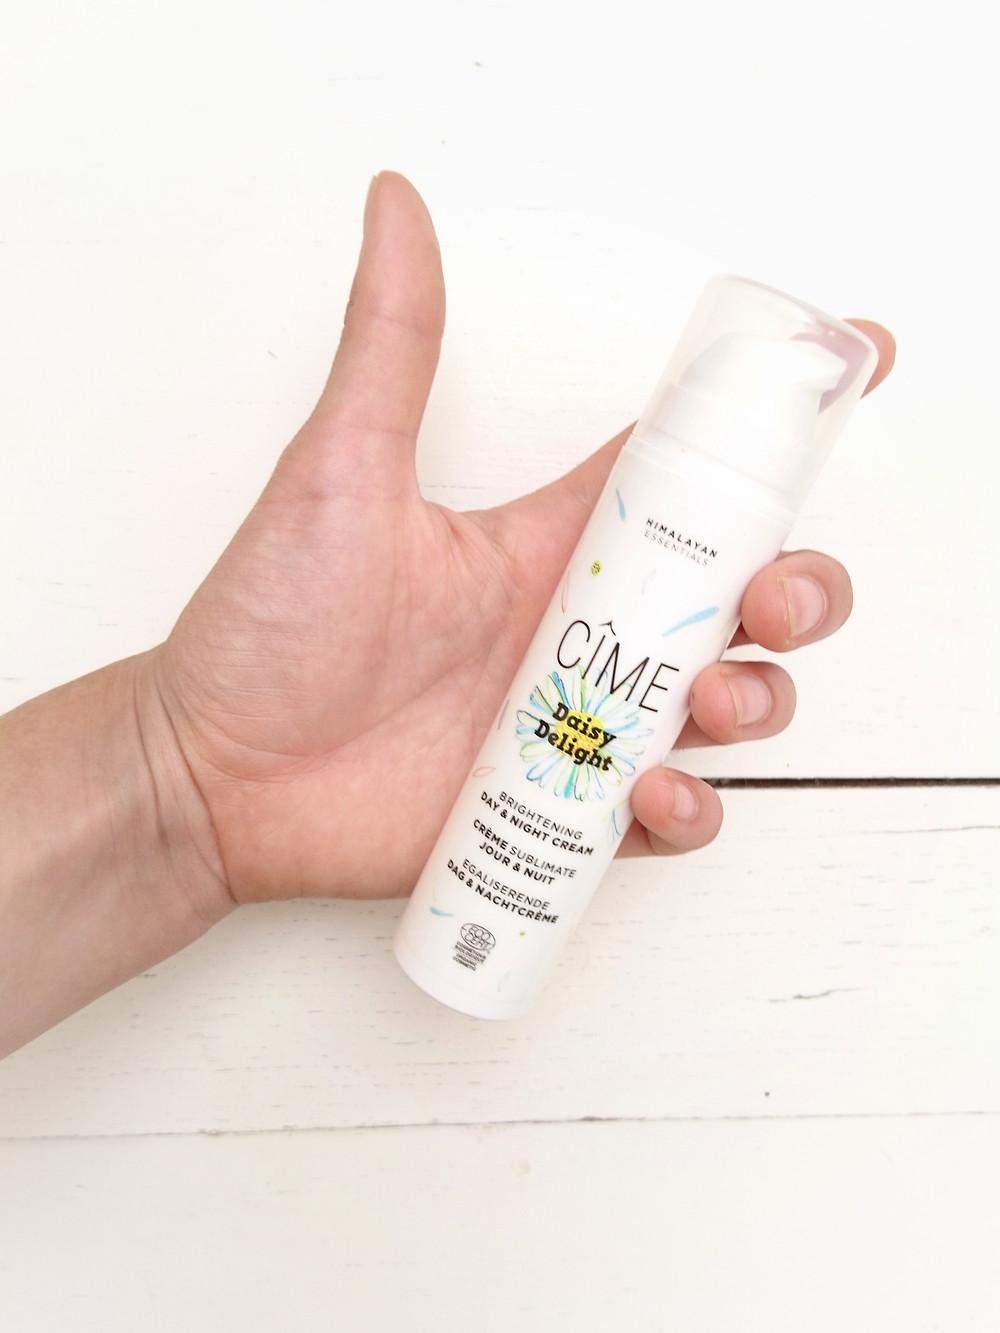 CIME, Daisy Delight, organic skincare, Miuxua